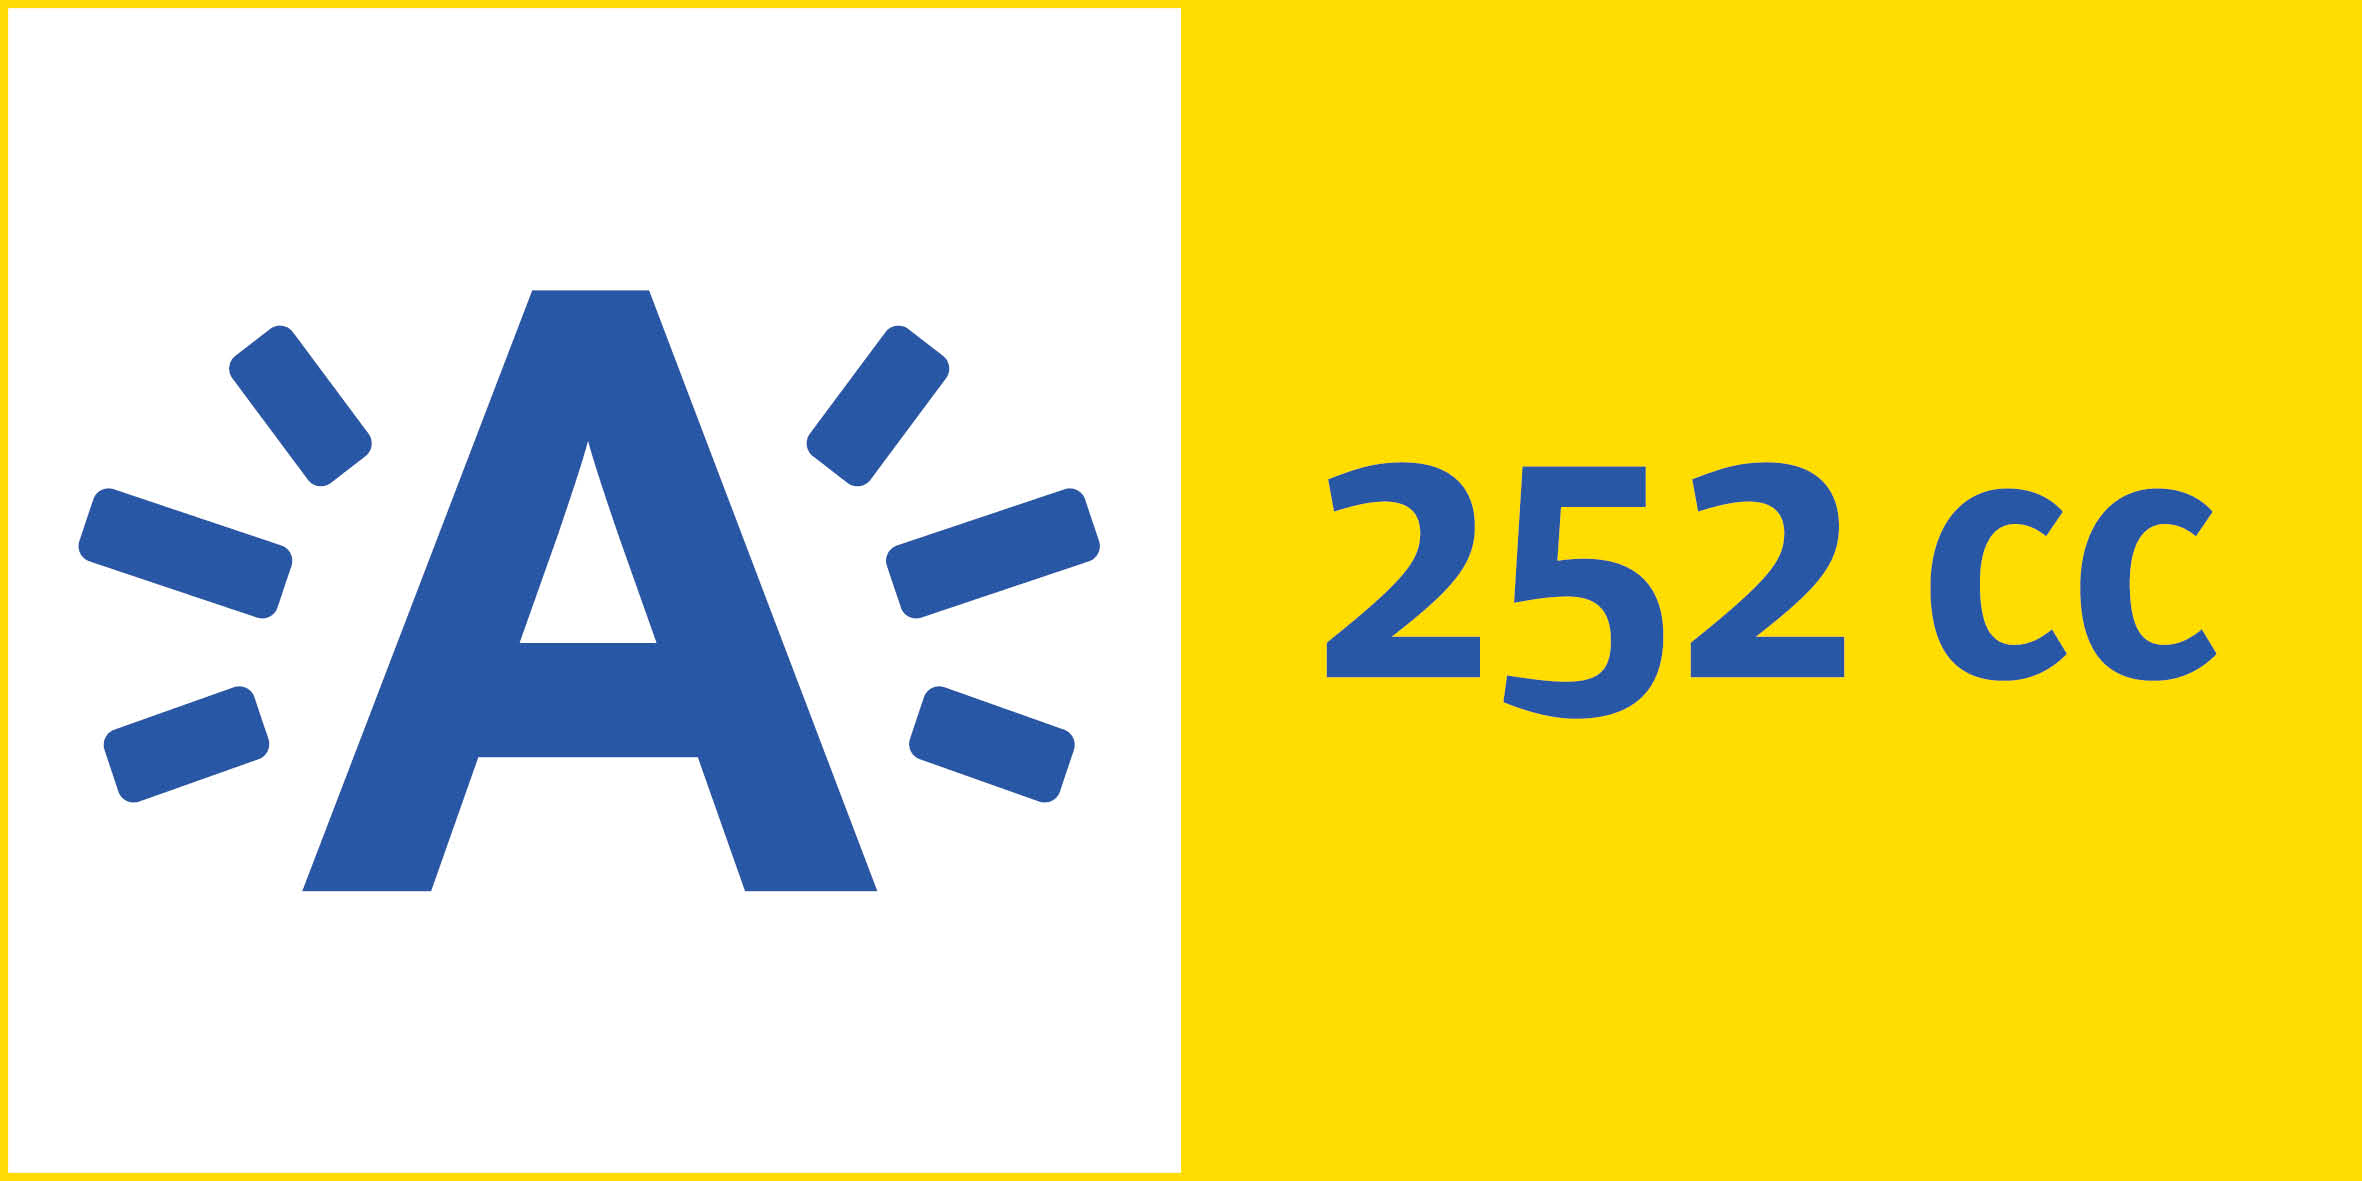 252cc